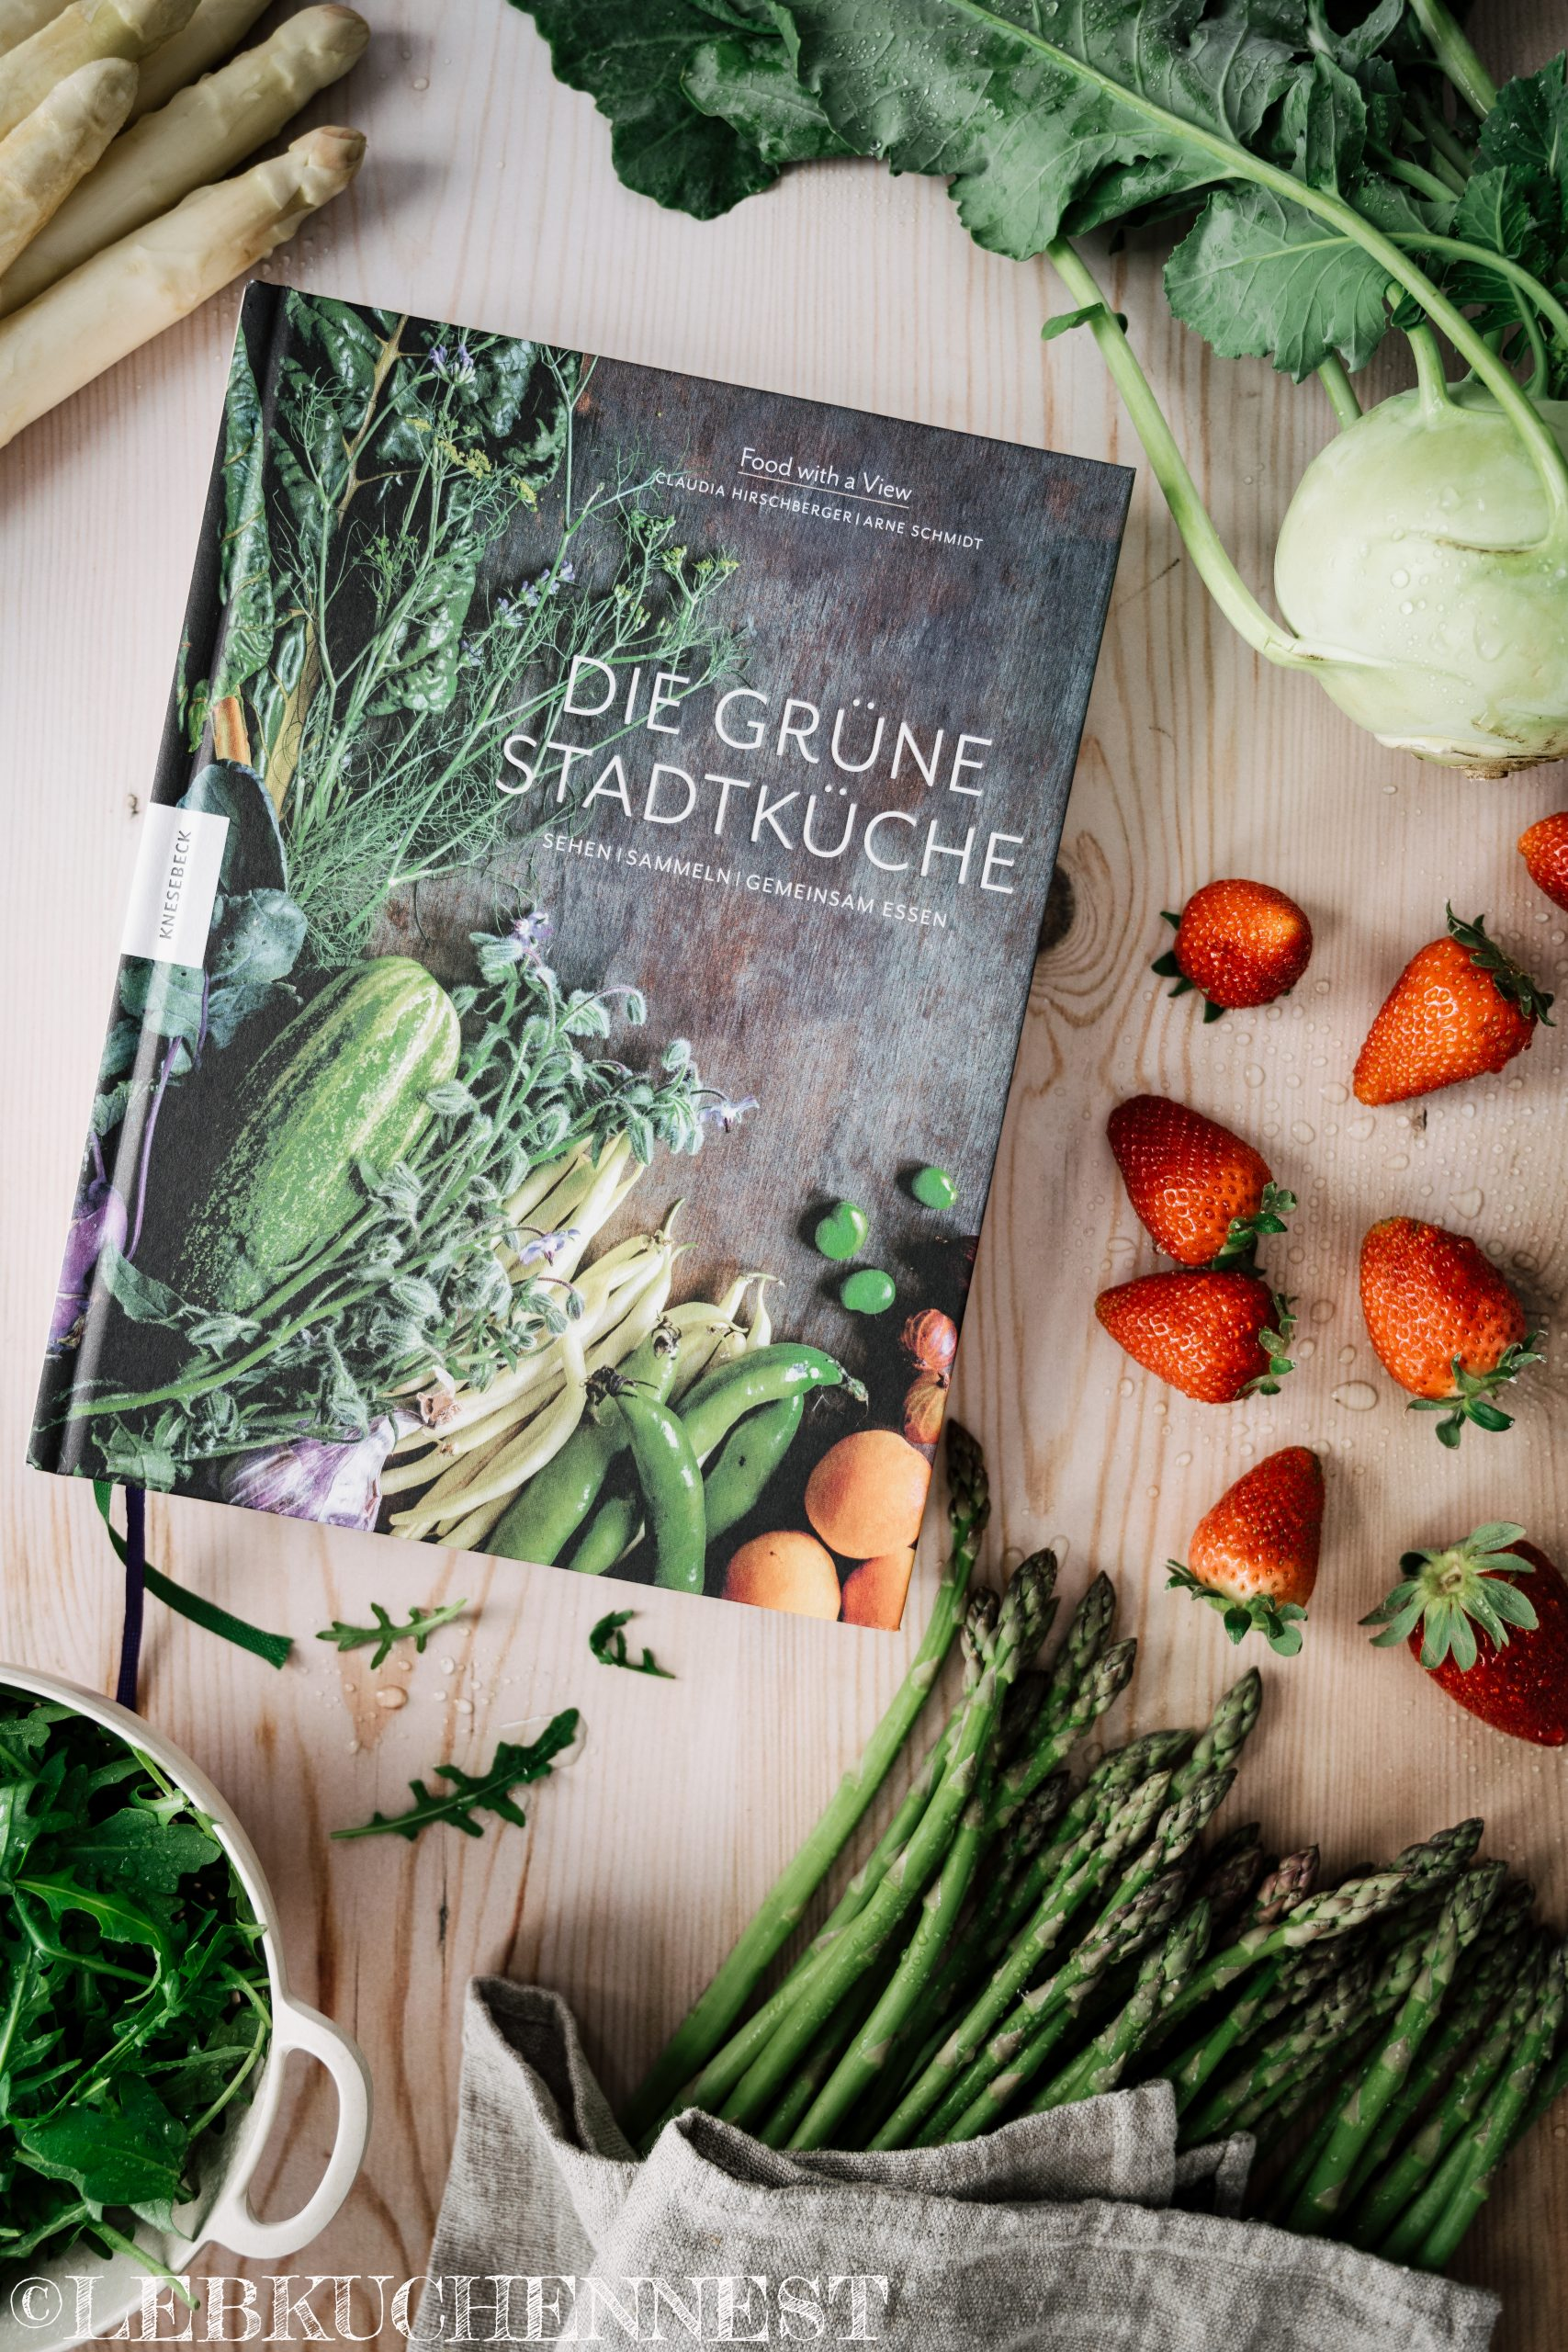 Grüne Stadtküche - Rezension